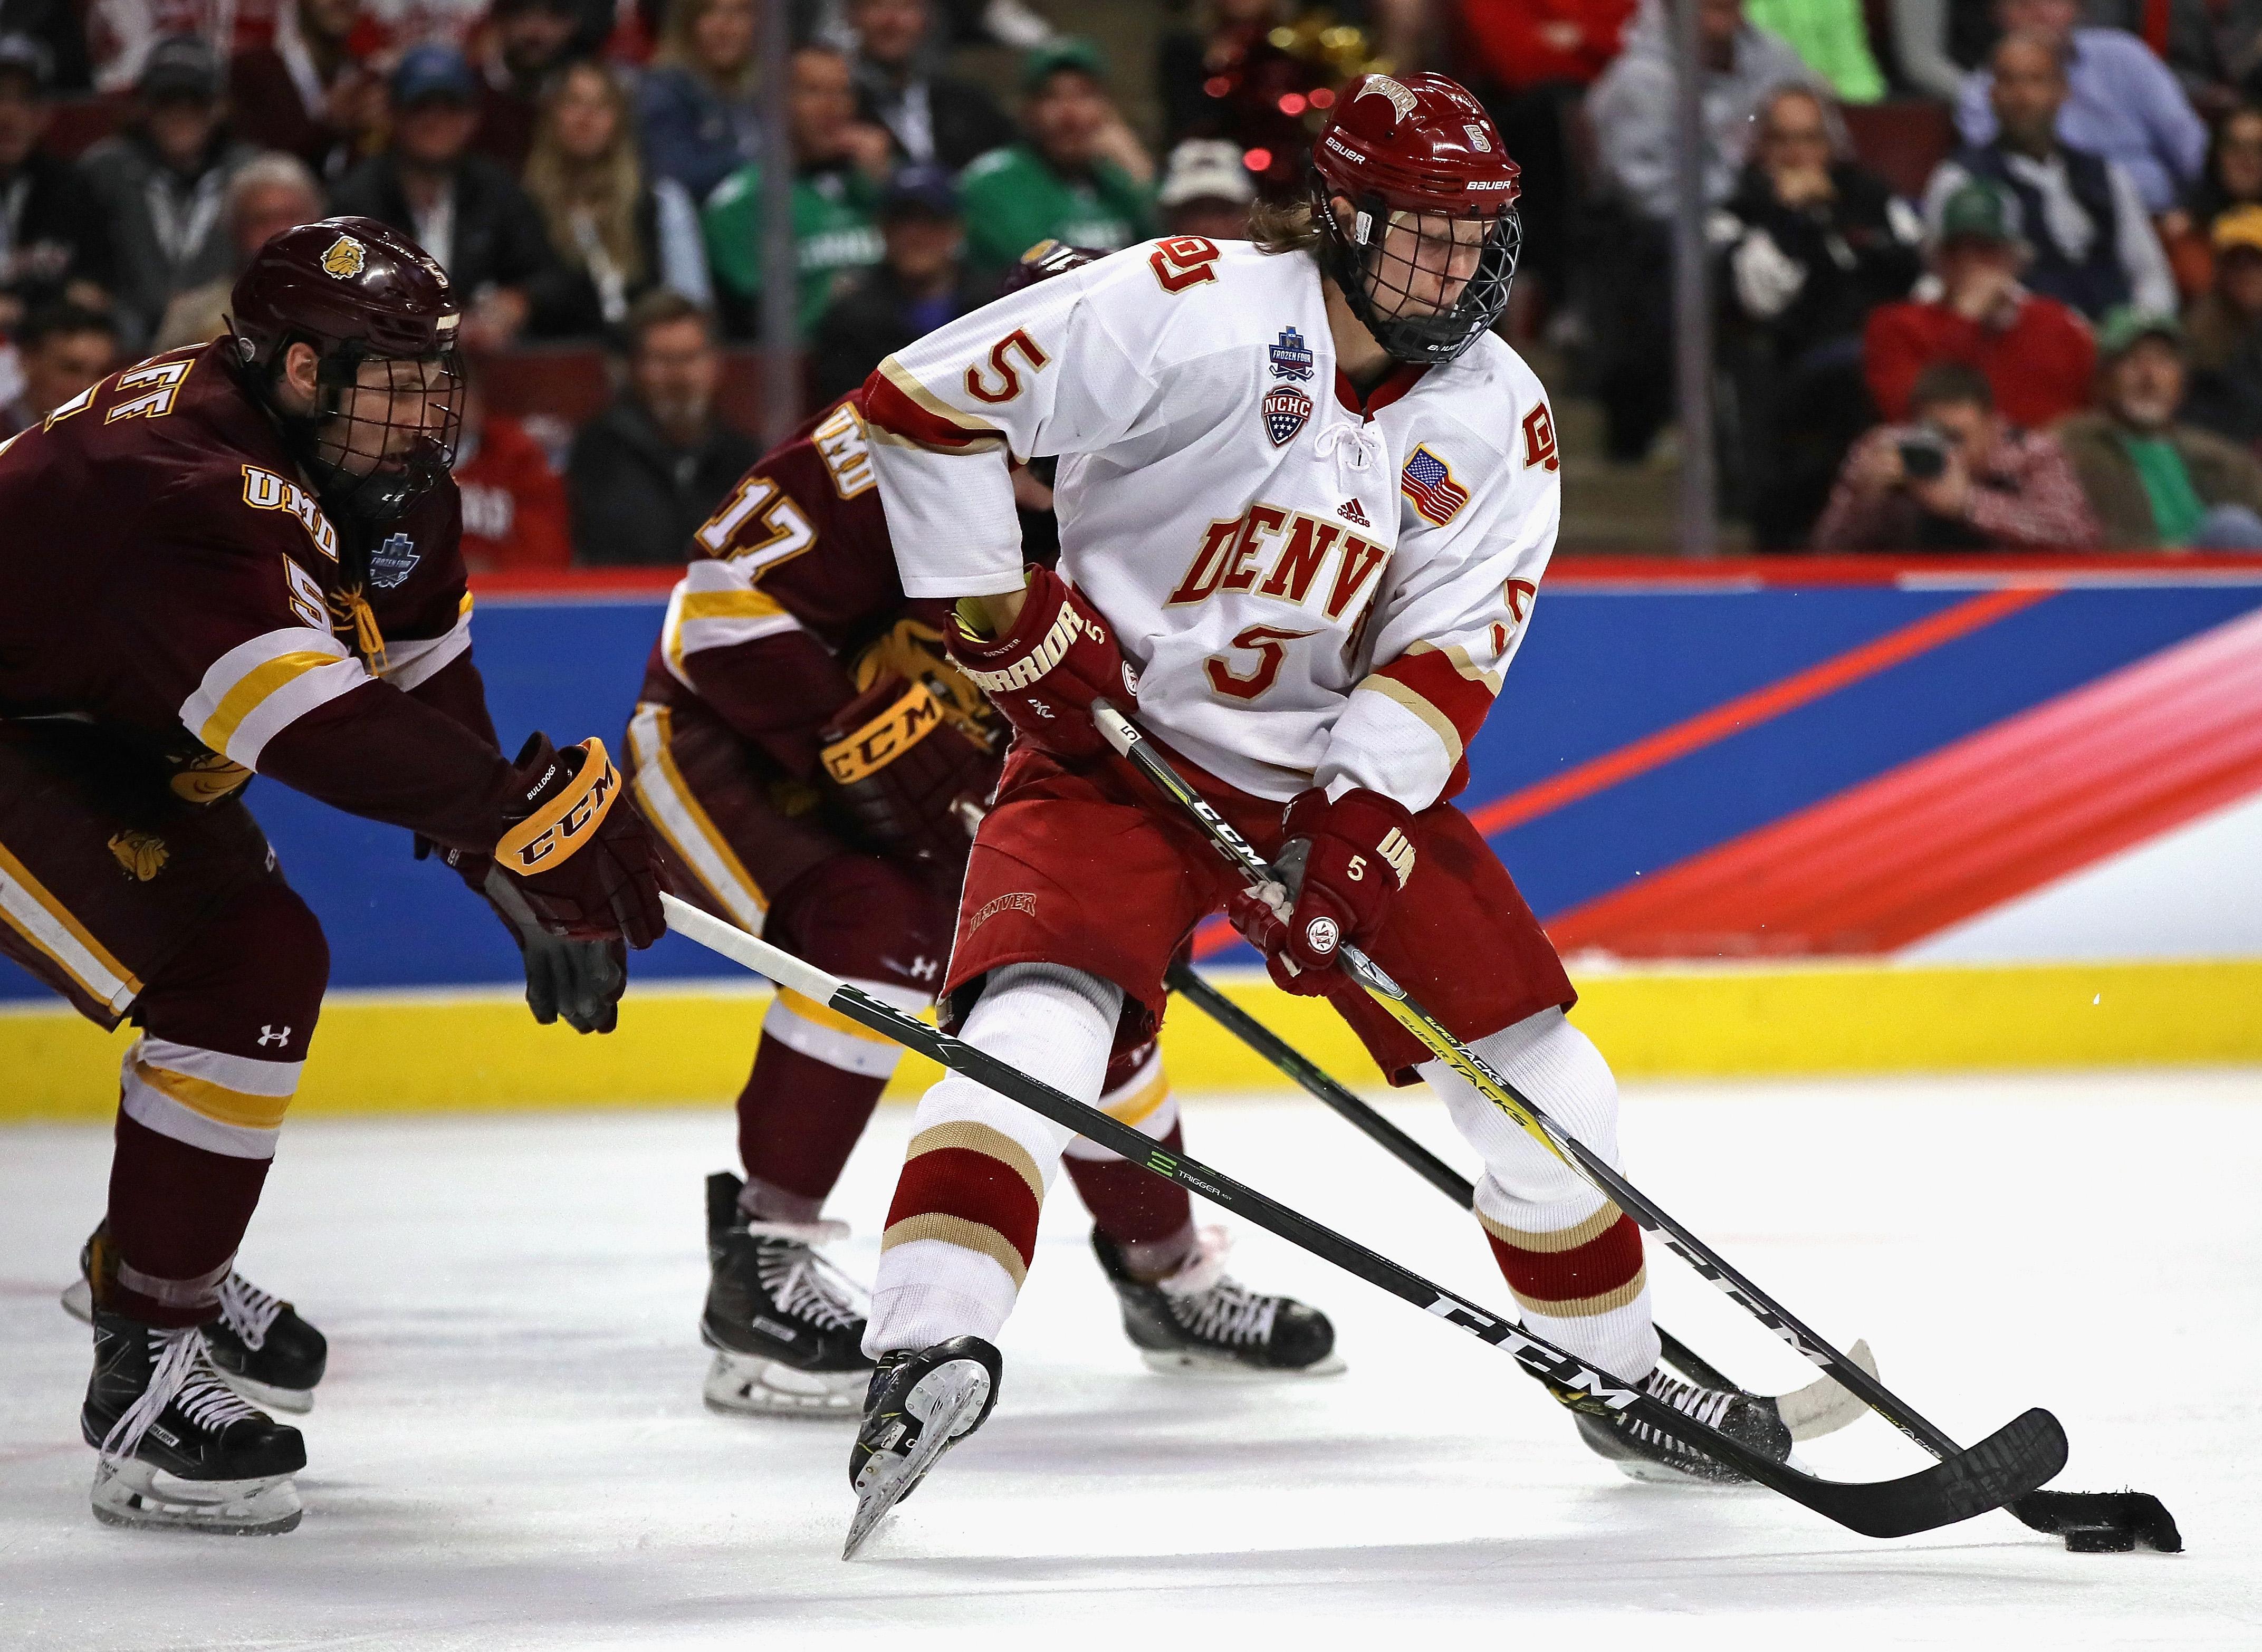 666334780-2017-ncaa-div-i-mens-ice-hockey-championships.jpg